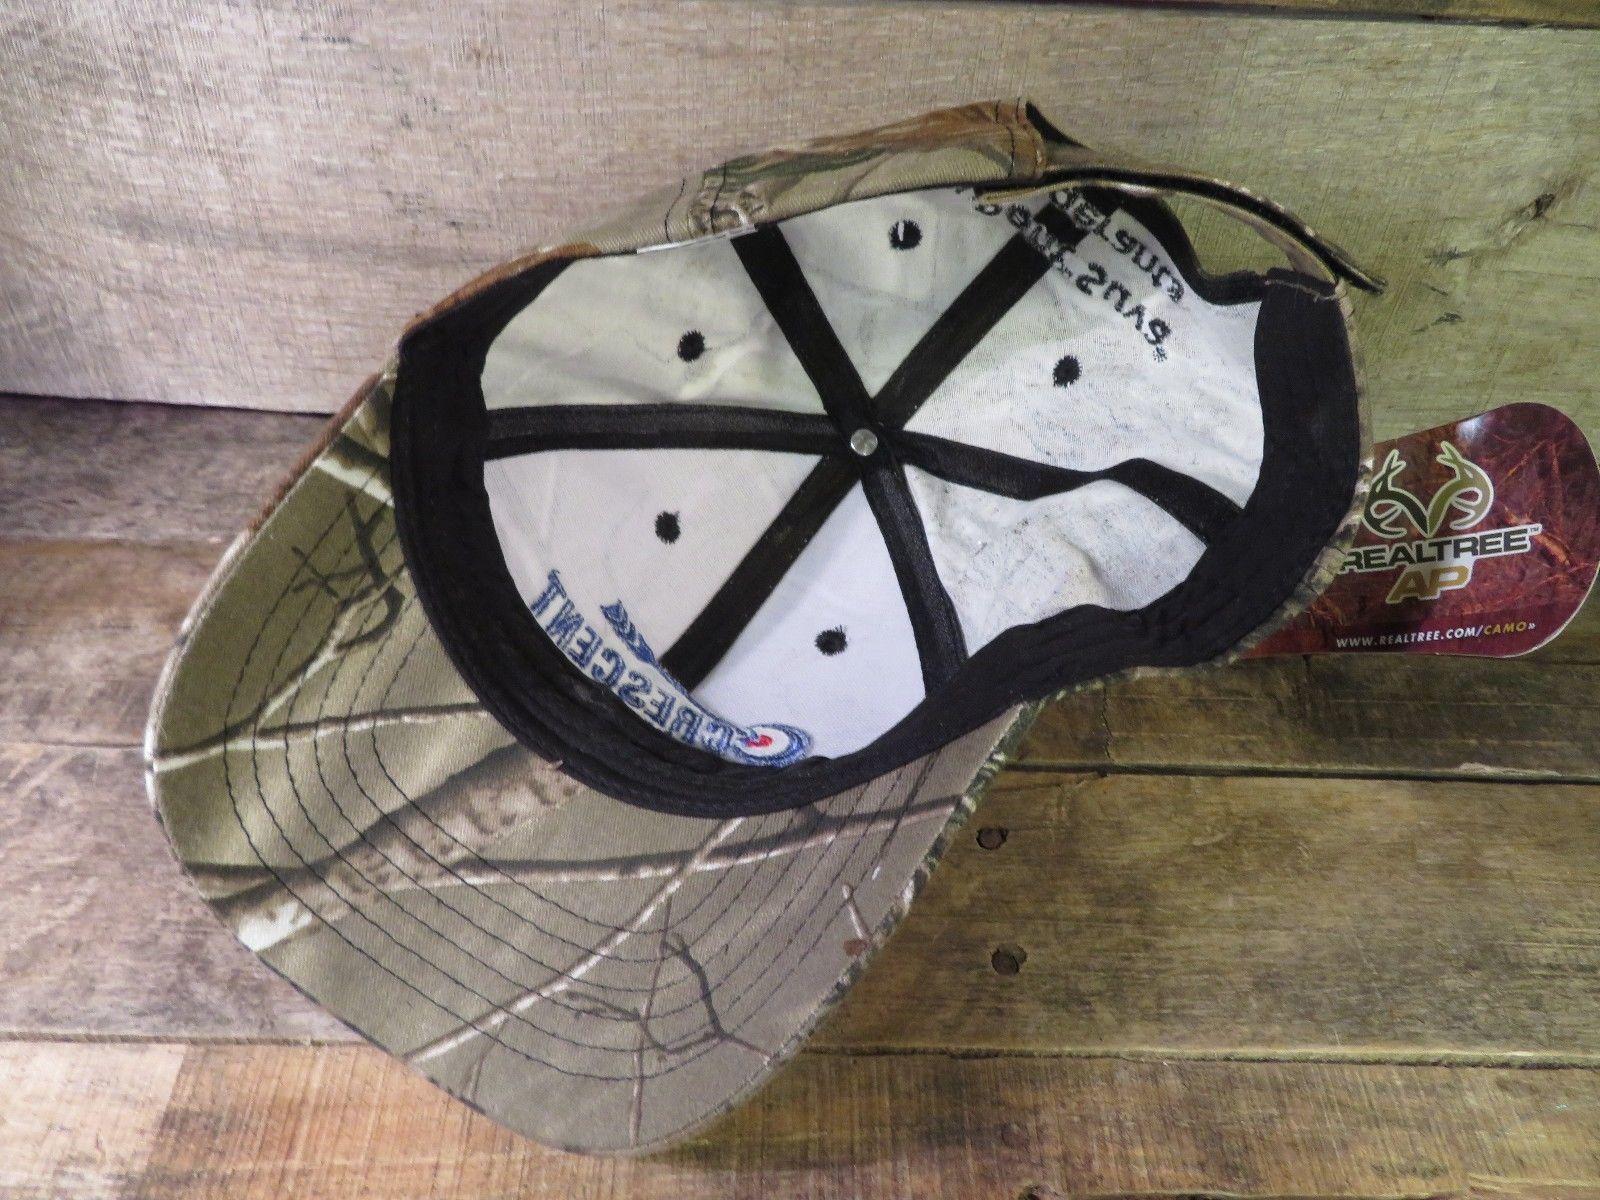 CRESCENT Parts & Equipment Camo Camouflage Adjustable Hat Adult Cap